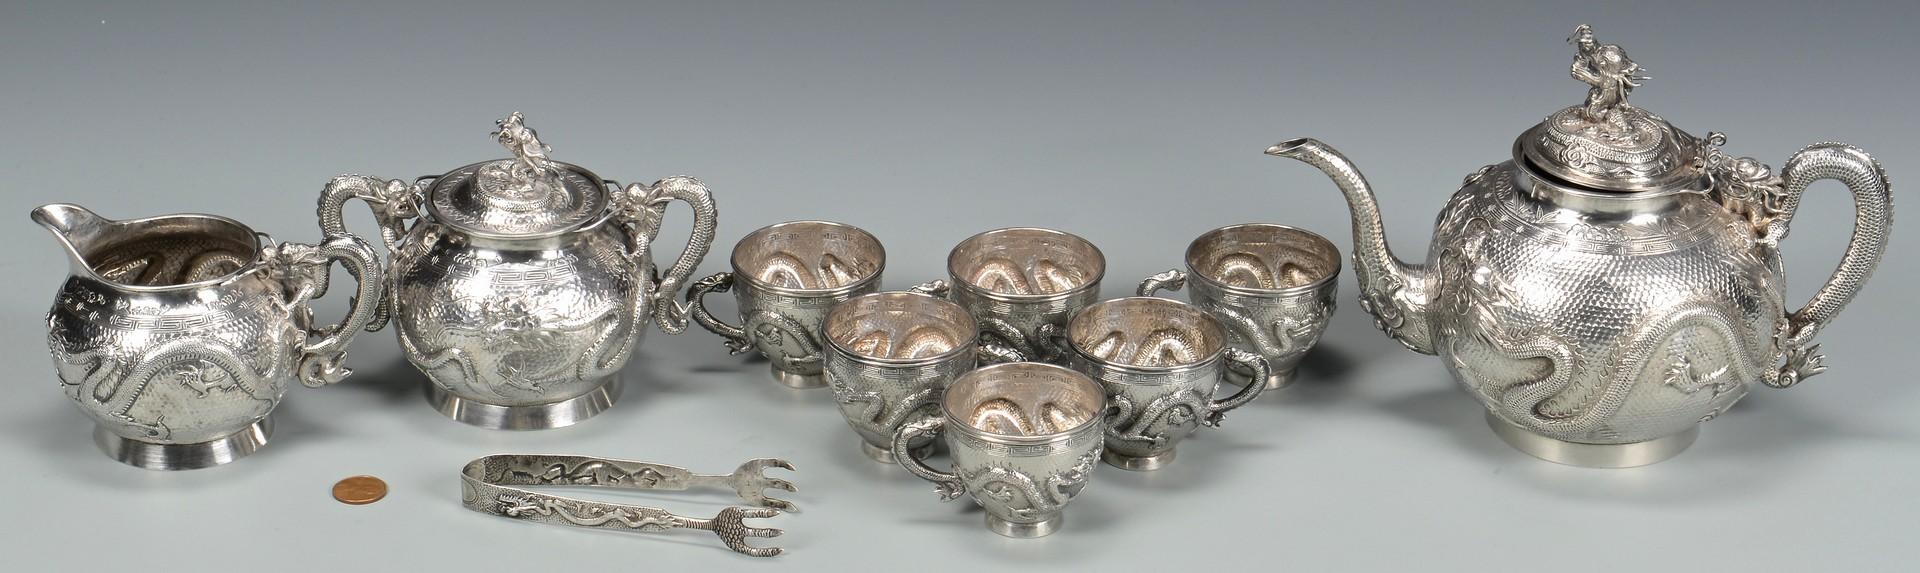 Lot 3: Chinese Export Silver Tea Set, 10 pcs